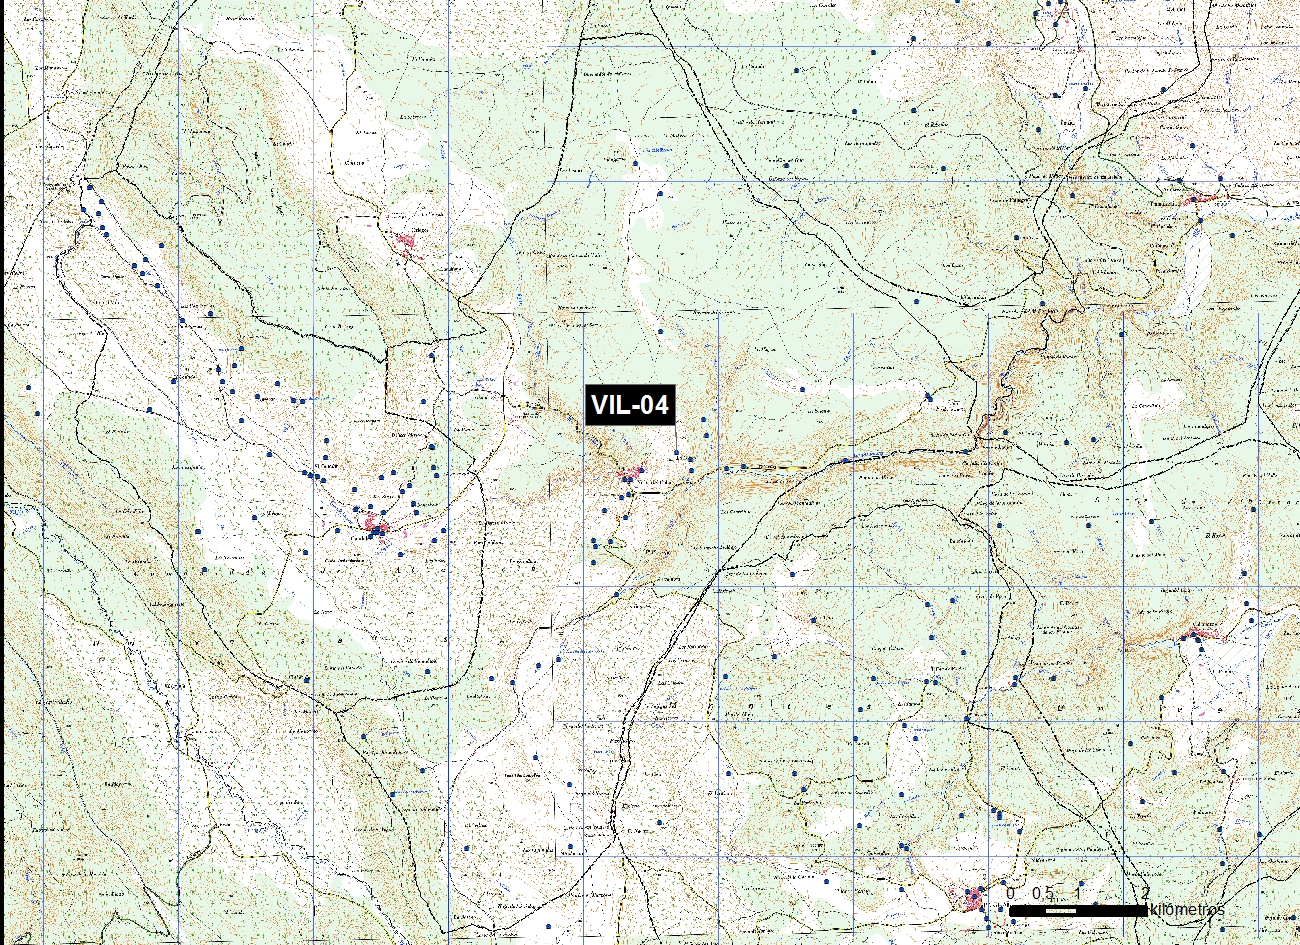 VIL_04_M.V.LOZANO_ELEGIDO_MAP.TOPO 1